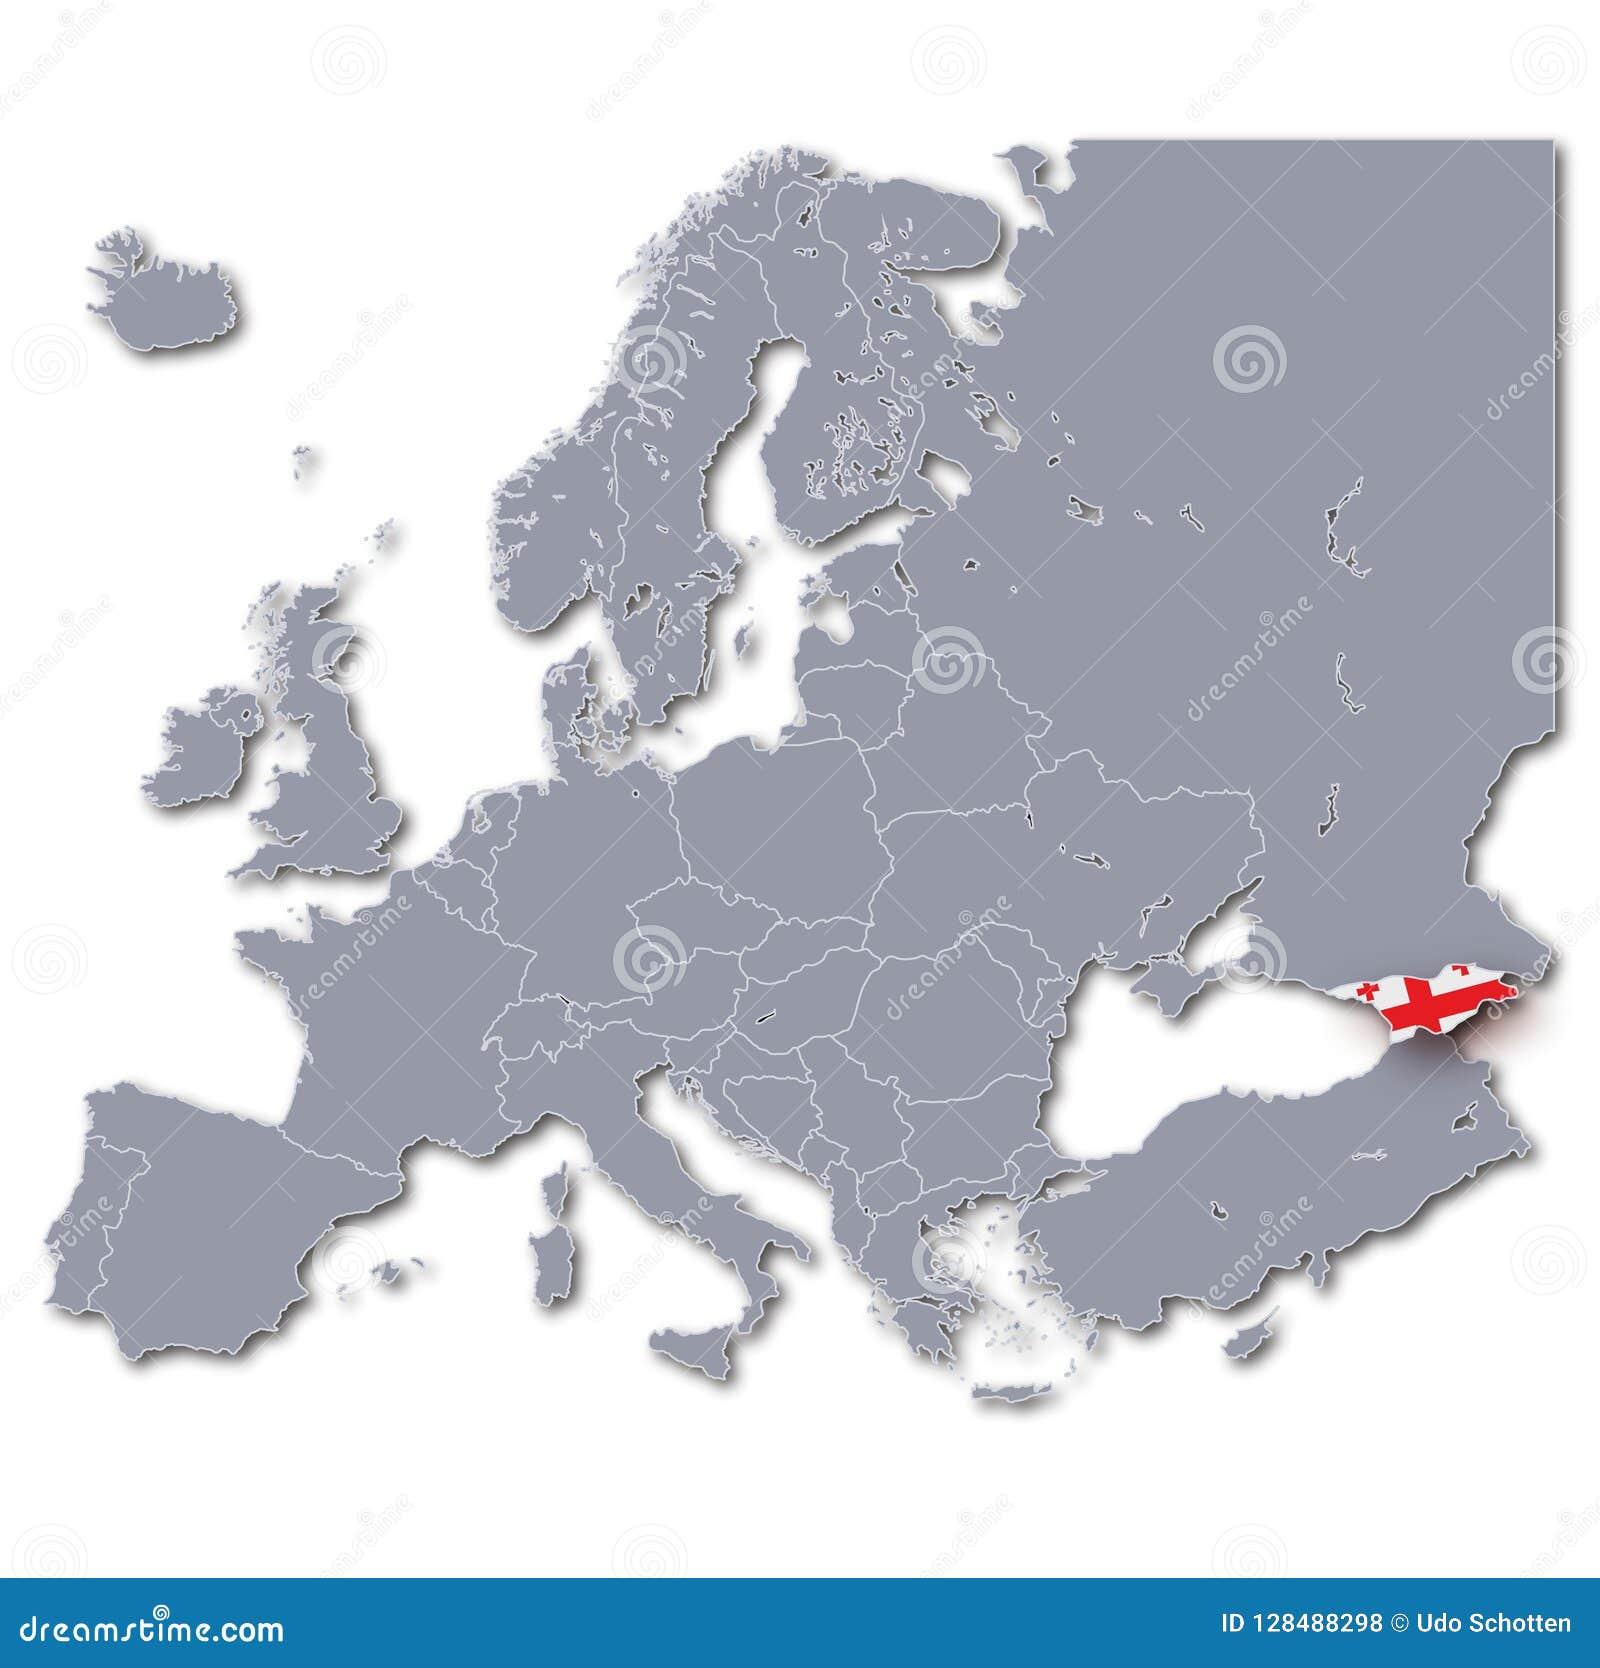 Georgia On Map Of Europe.Map Of Europe With Georgia Stock Illustration Illustration Of